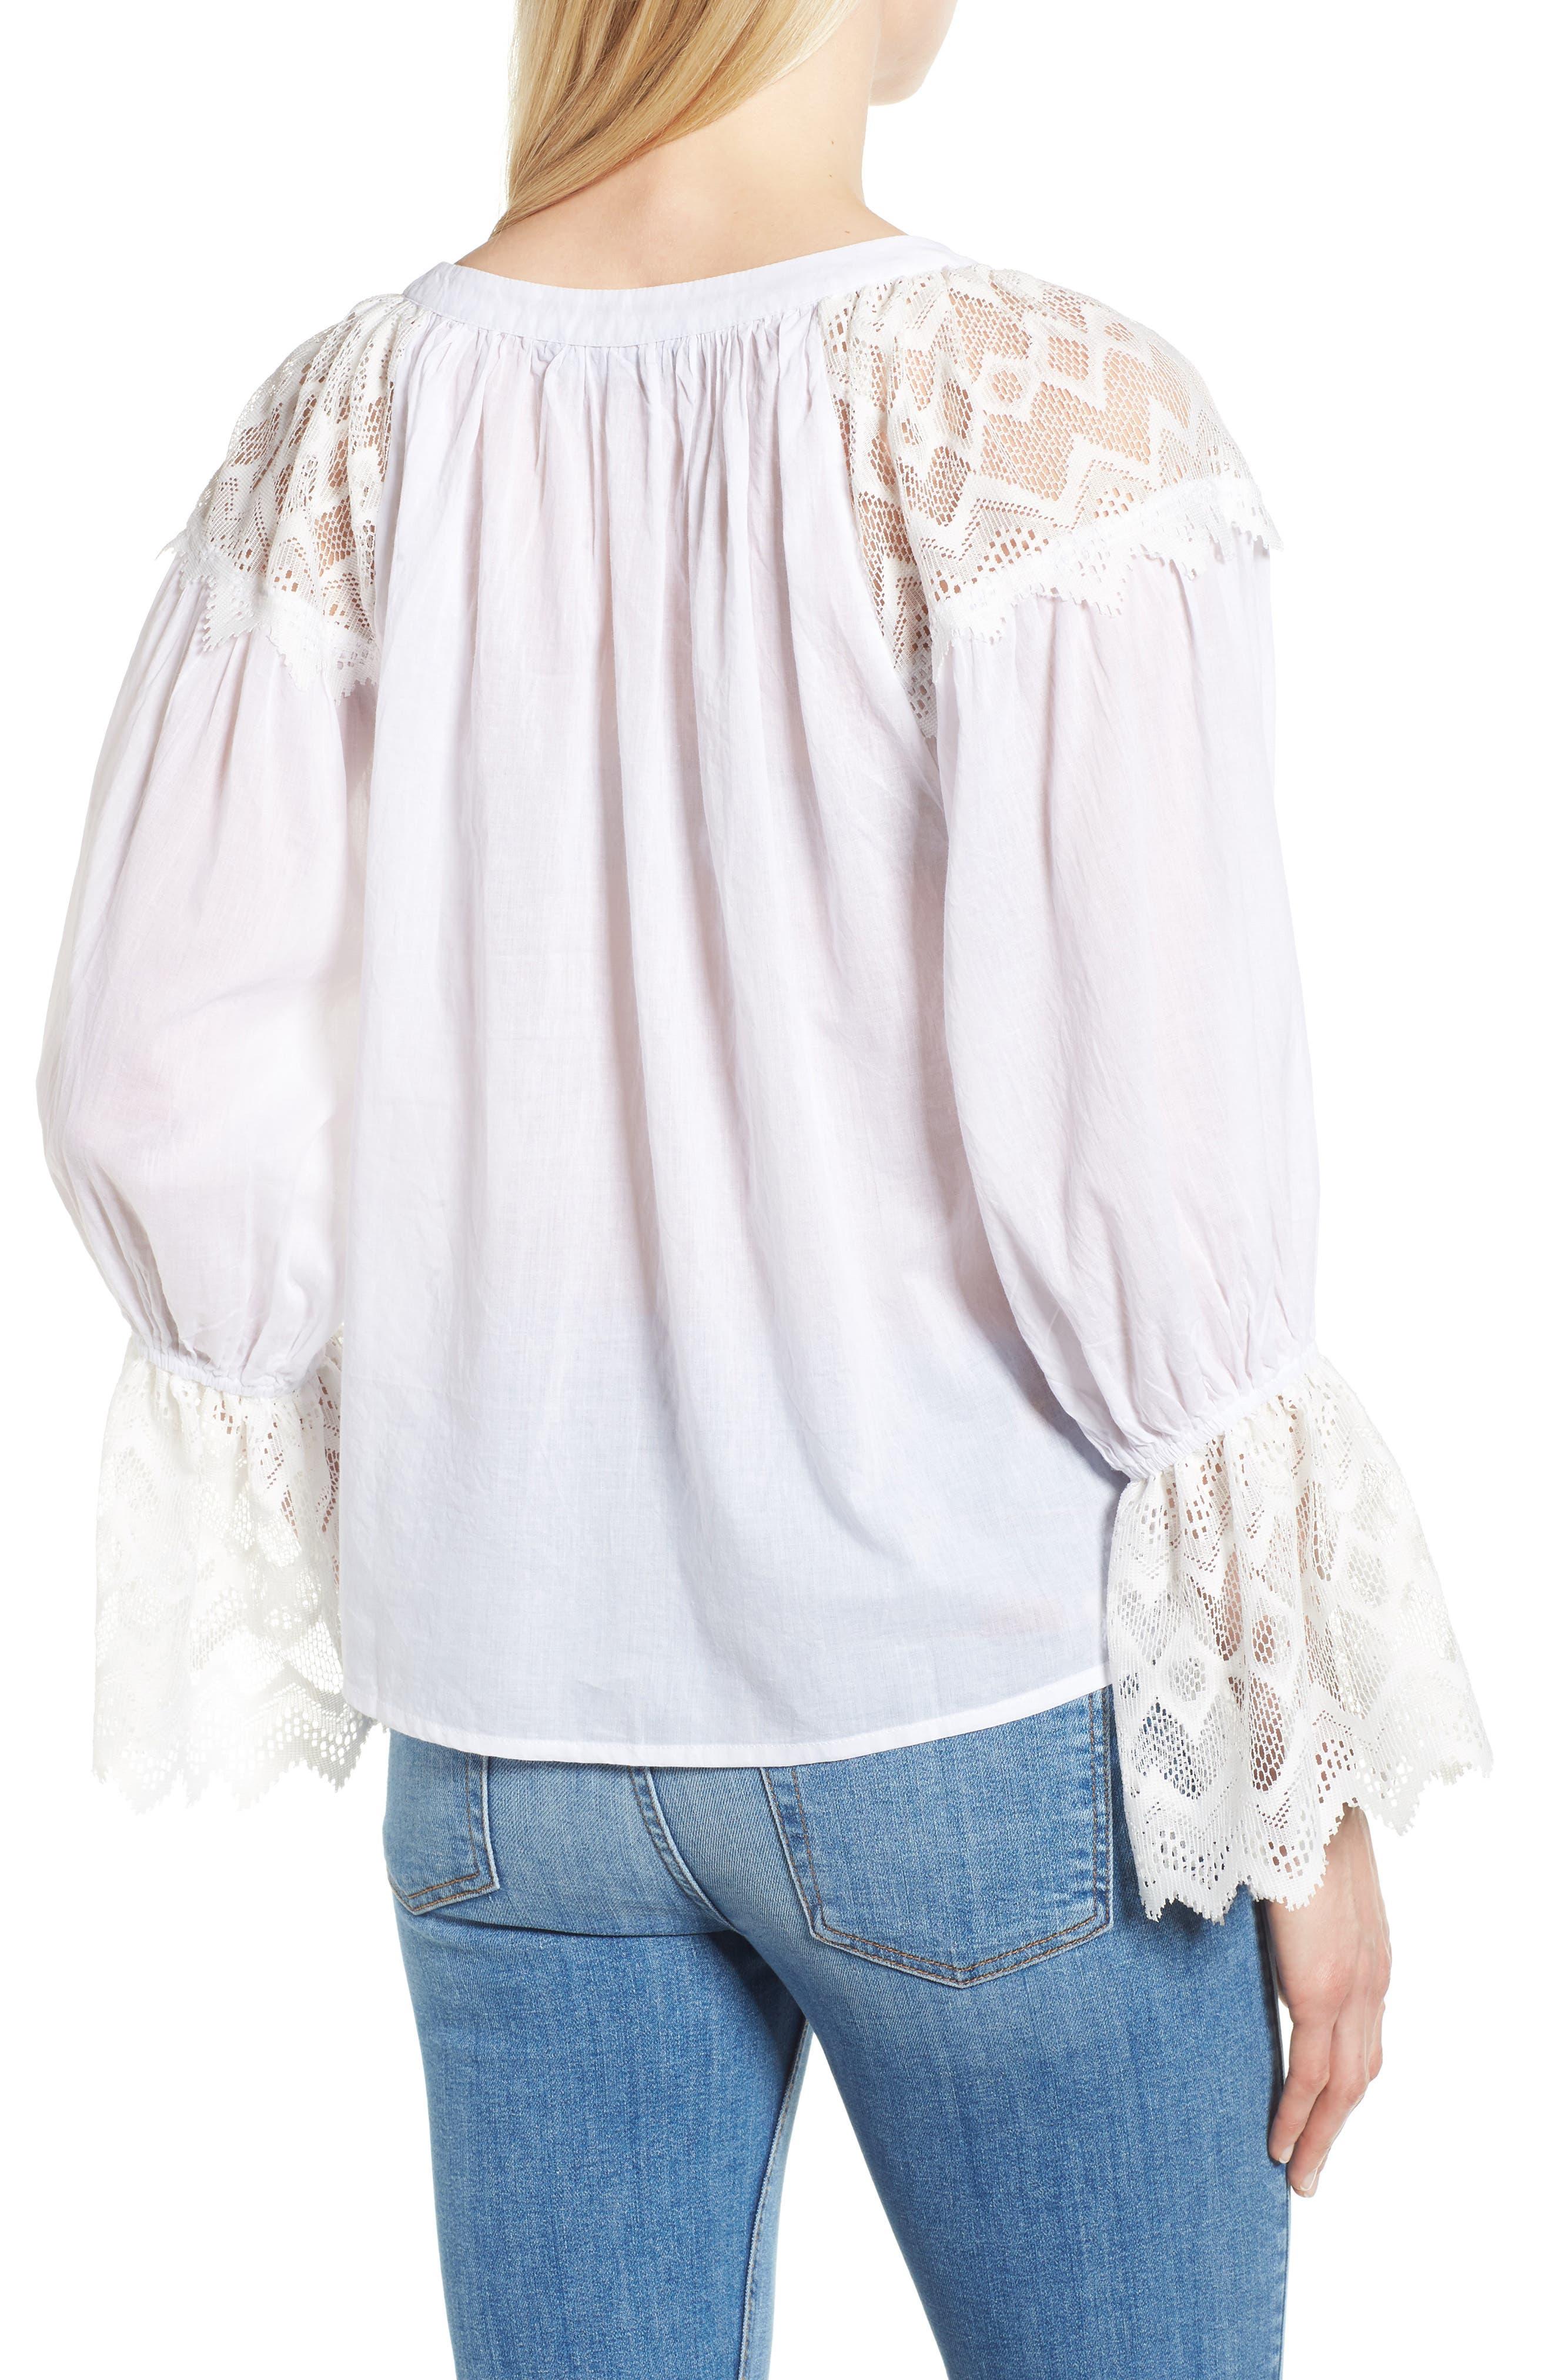 Berkley White Lace Cotton Blend Top,                             Alternate thumbnail 2, color,                             WHITE